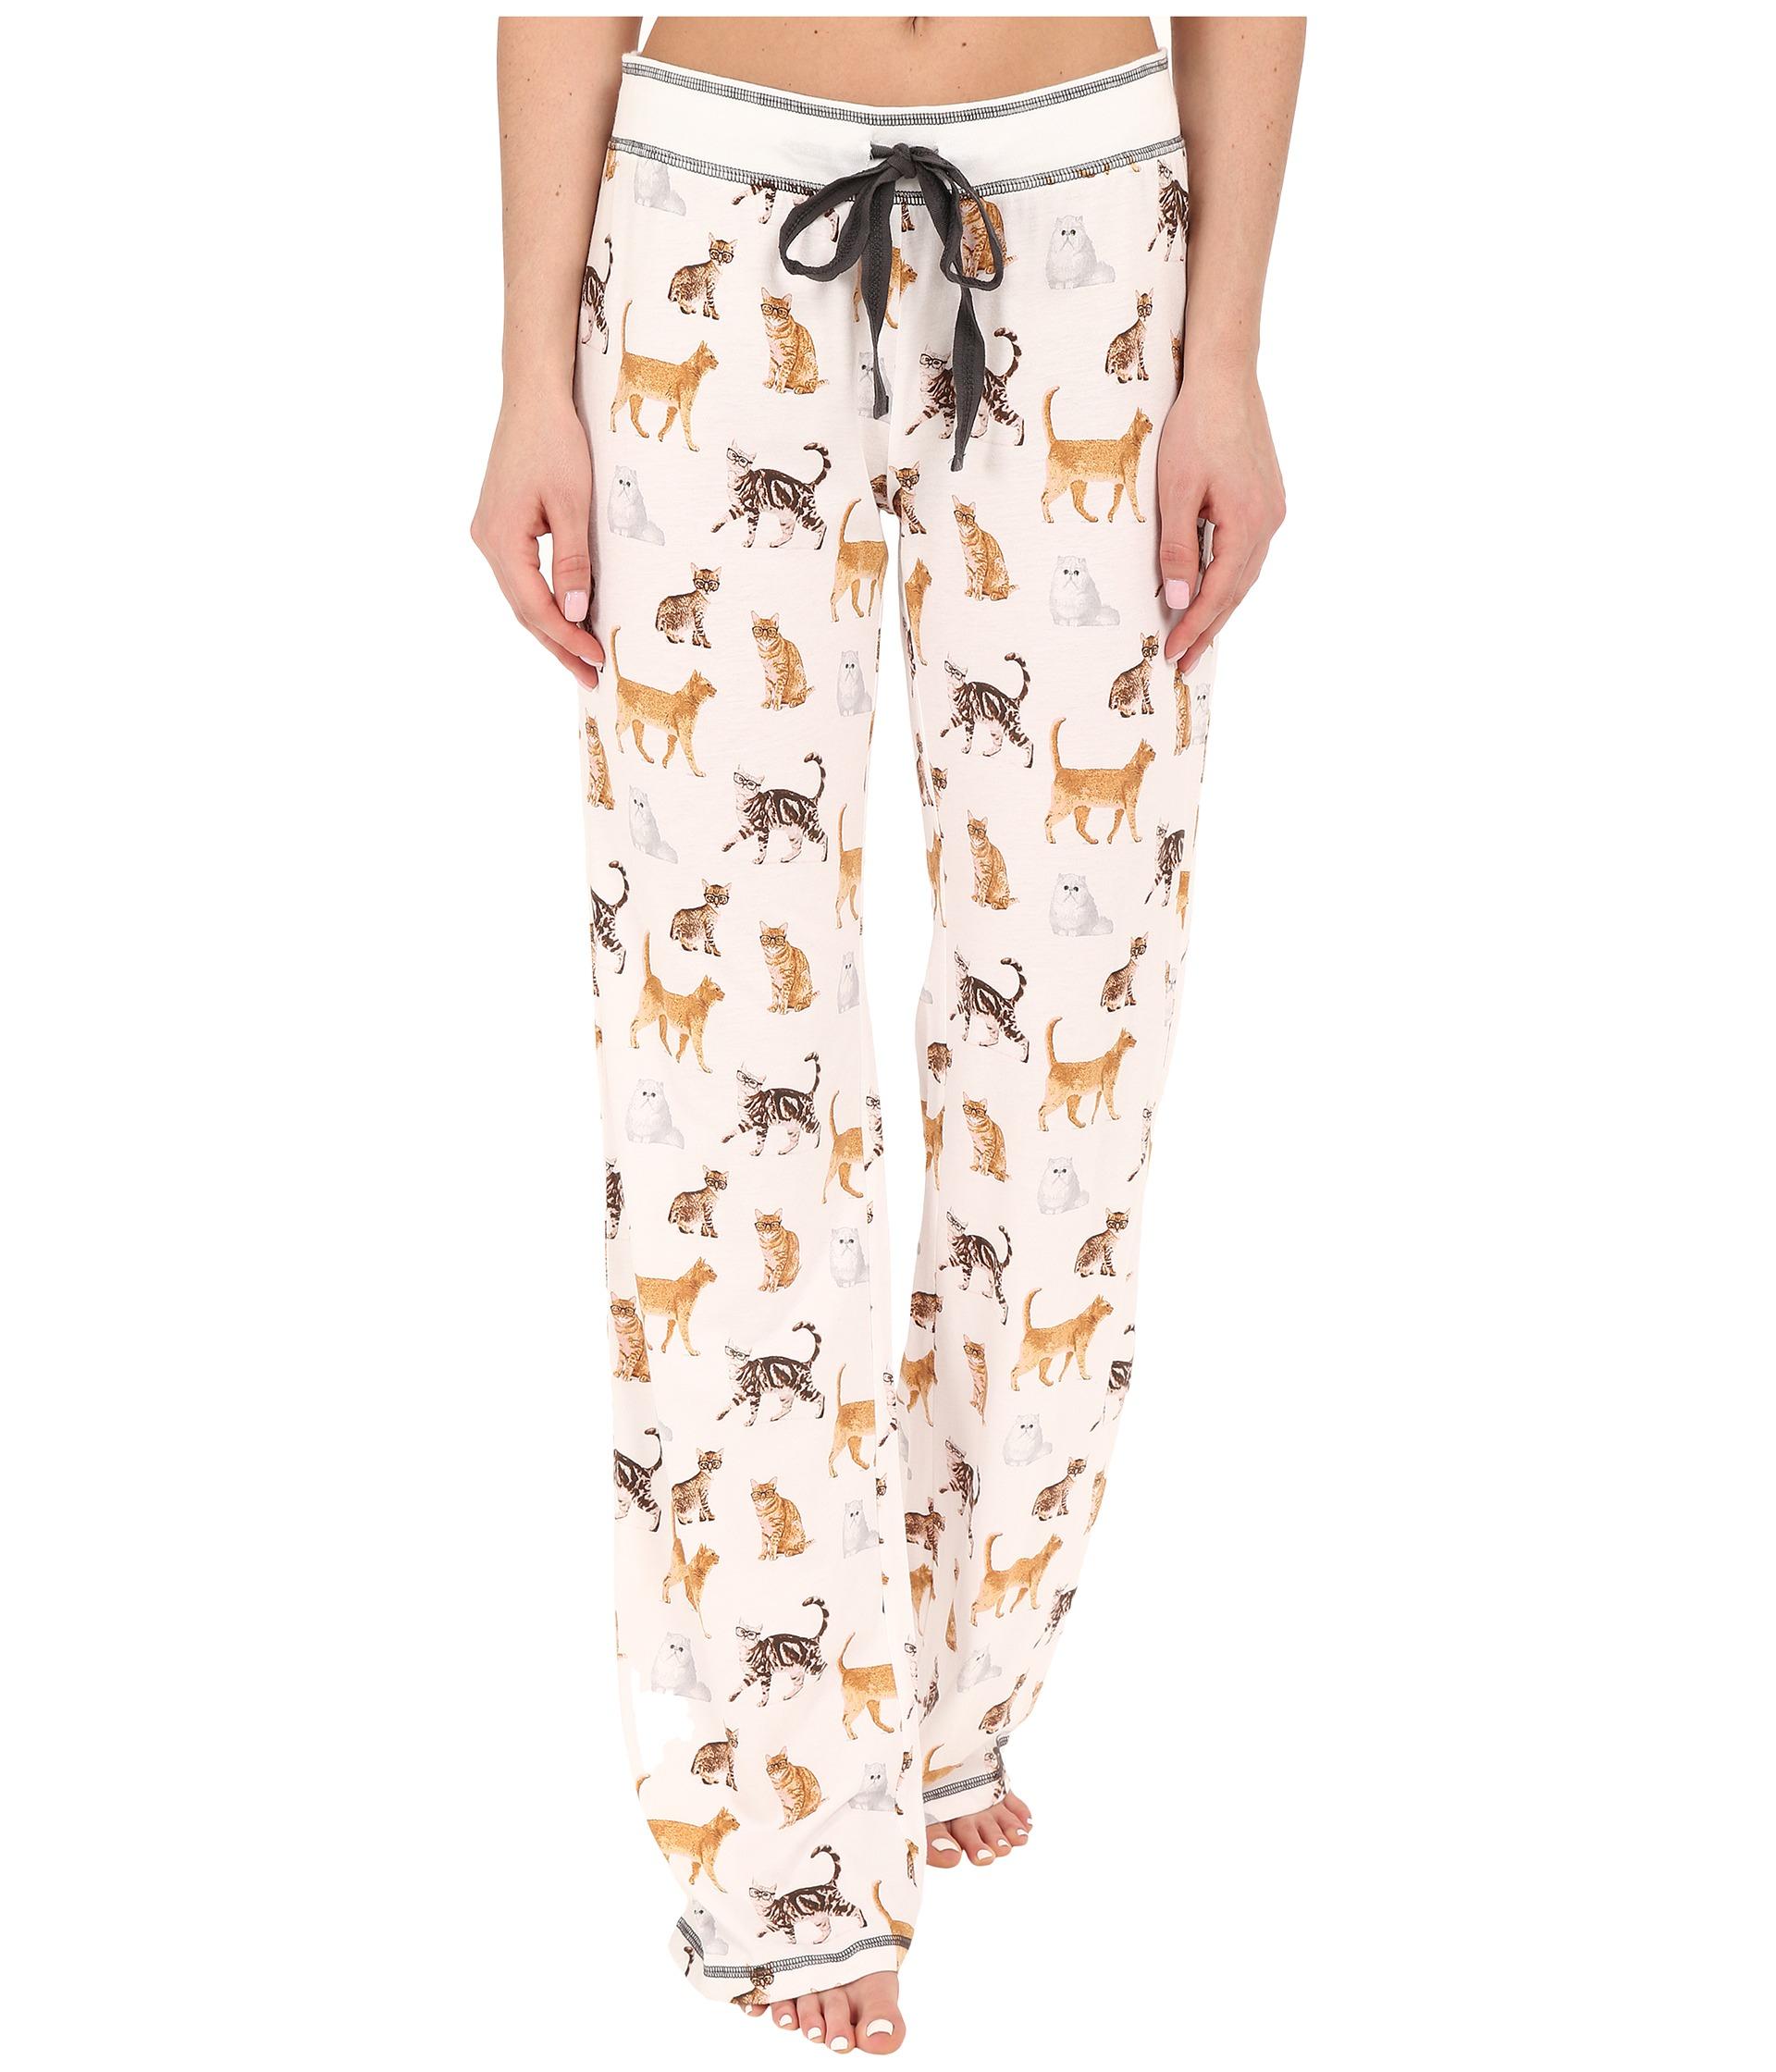 Pj salvage Cat Print Pj Pants in White